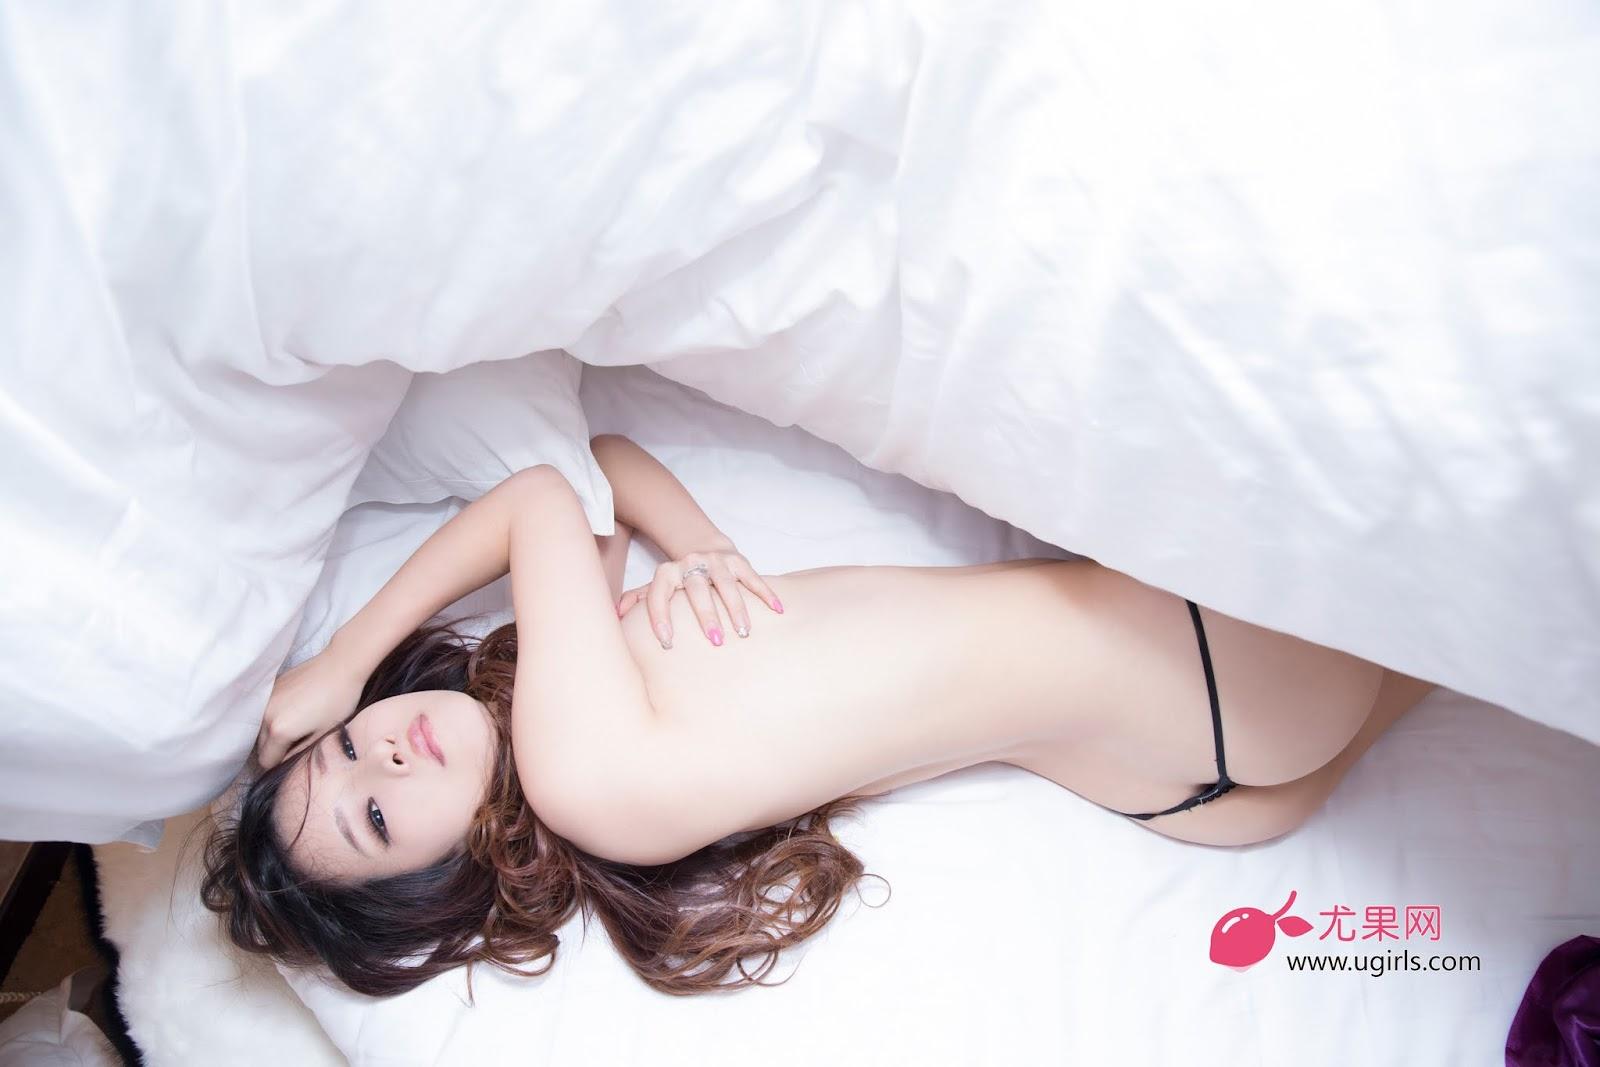 A14A6367 - Hot Photo UGIRLS NO.5 Nude Girl